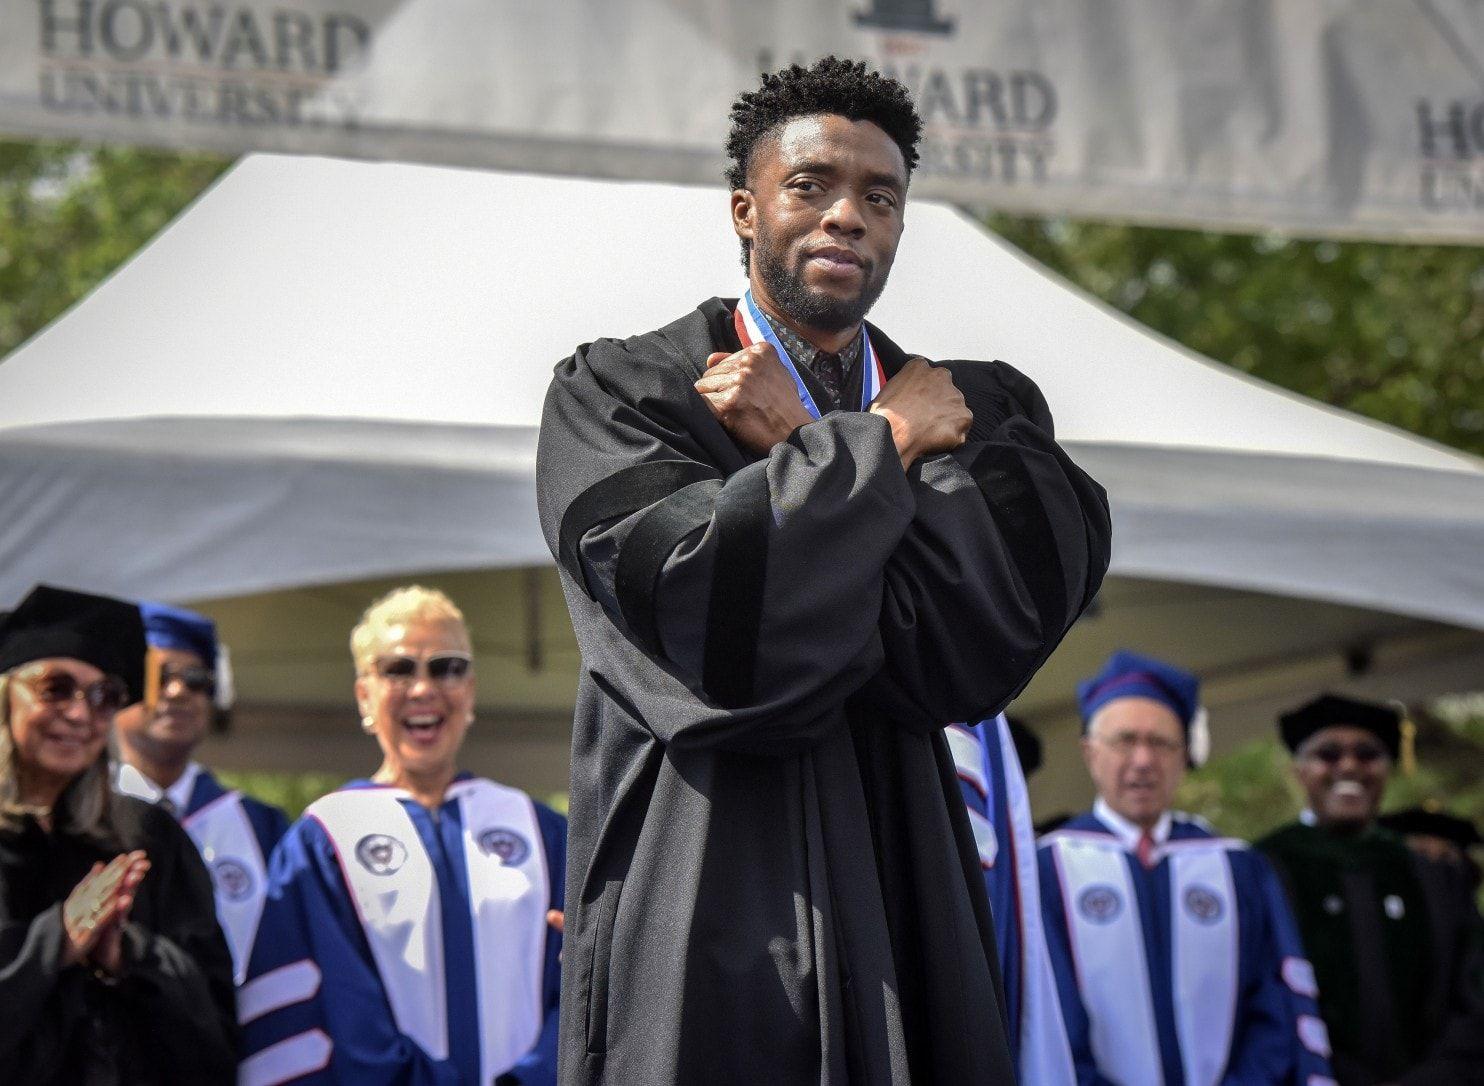 The actor Chadwick Boseman delivered remarks at Howard, his alma mater.